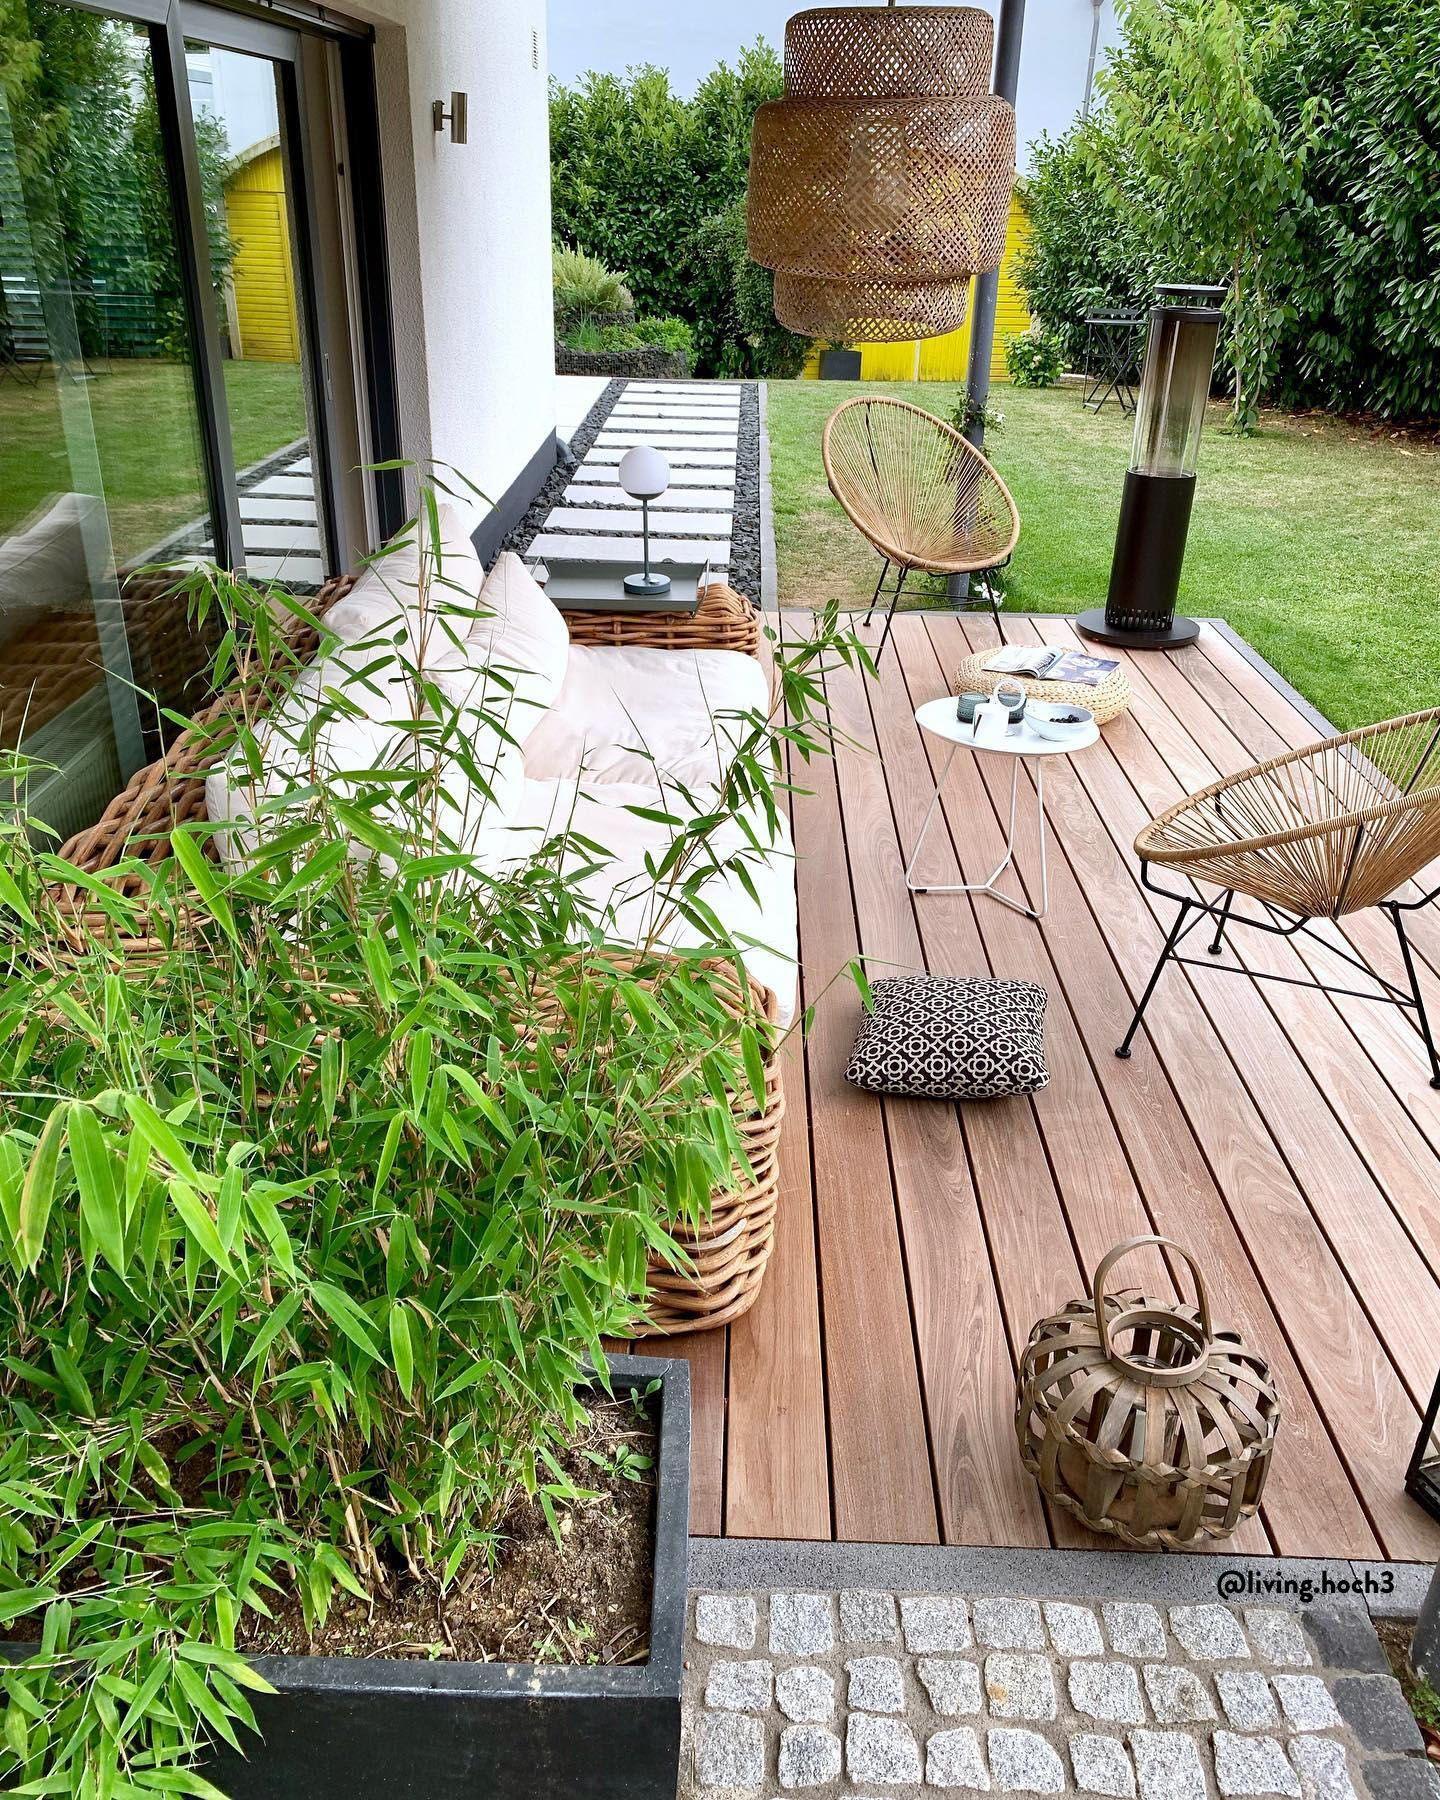 Loungesessel Bahia Aus Kunststoff Geflecht Westwingnow Lounge Sessel Gartensessel Pflanzen